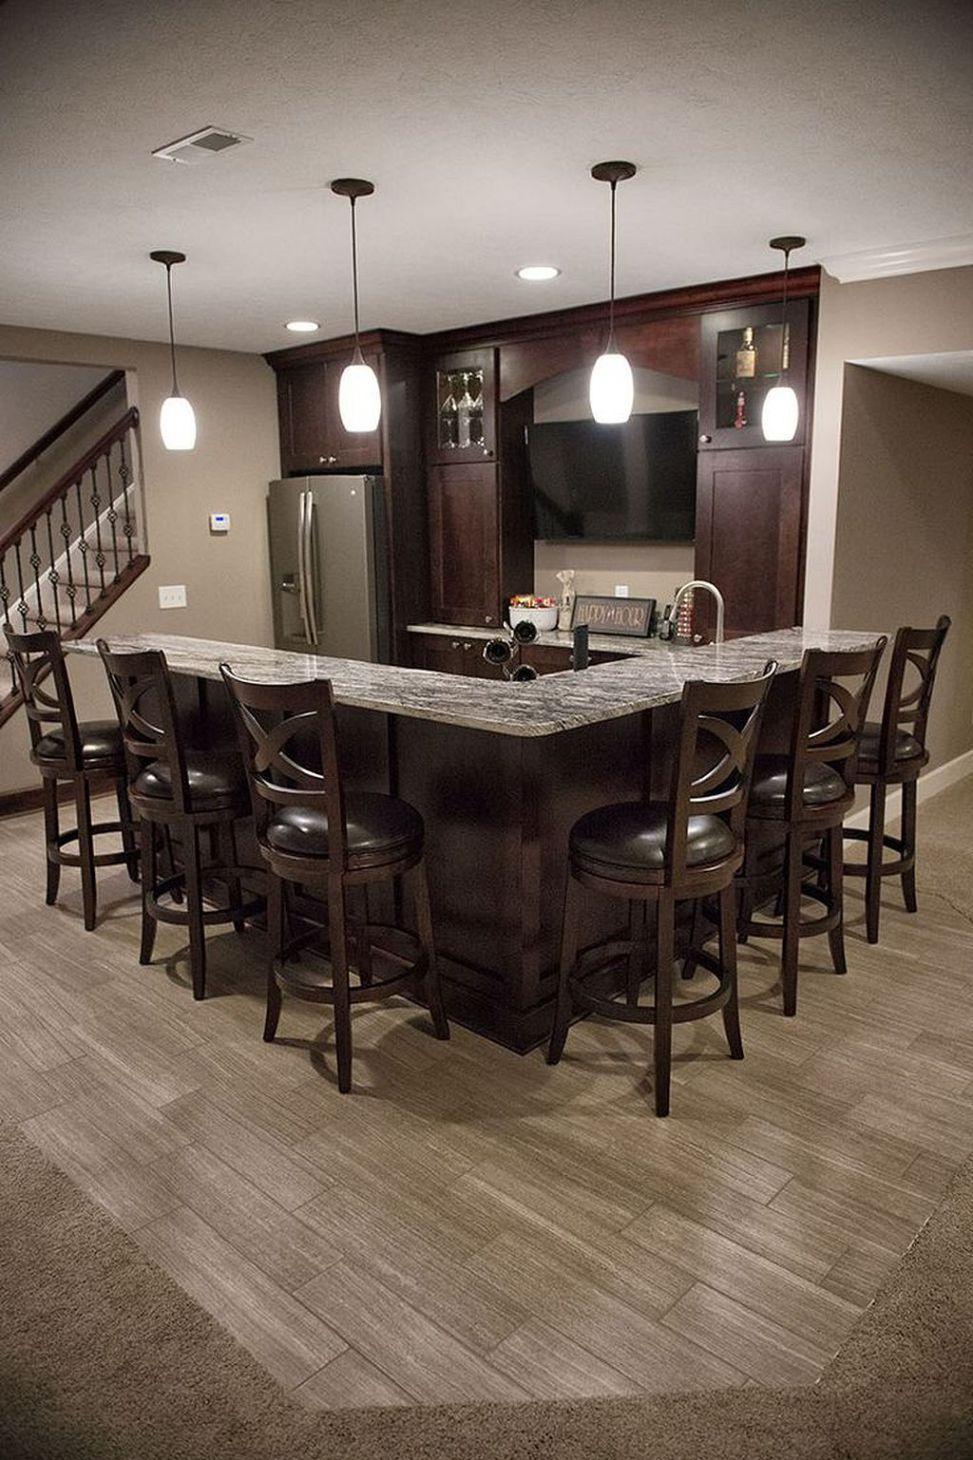 Incredible Basement Remodel Ideas (13)   Kitchens   Pinterest ...